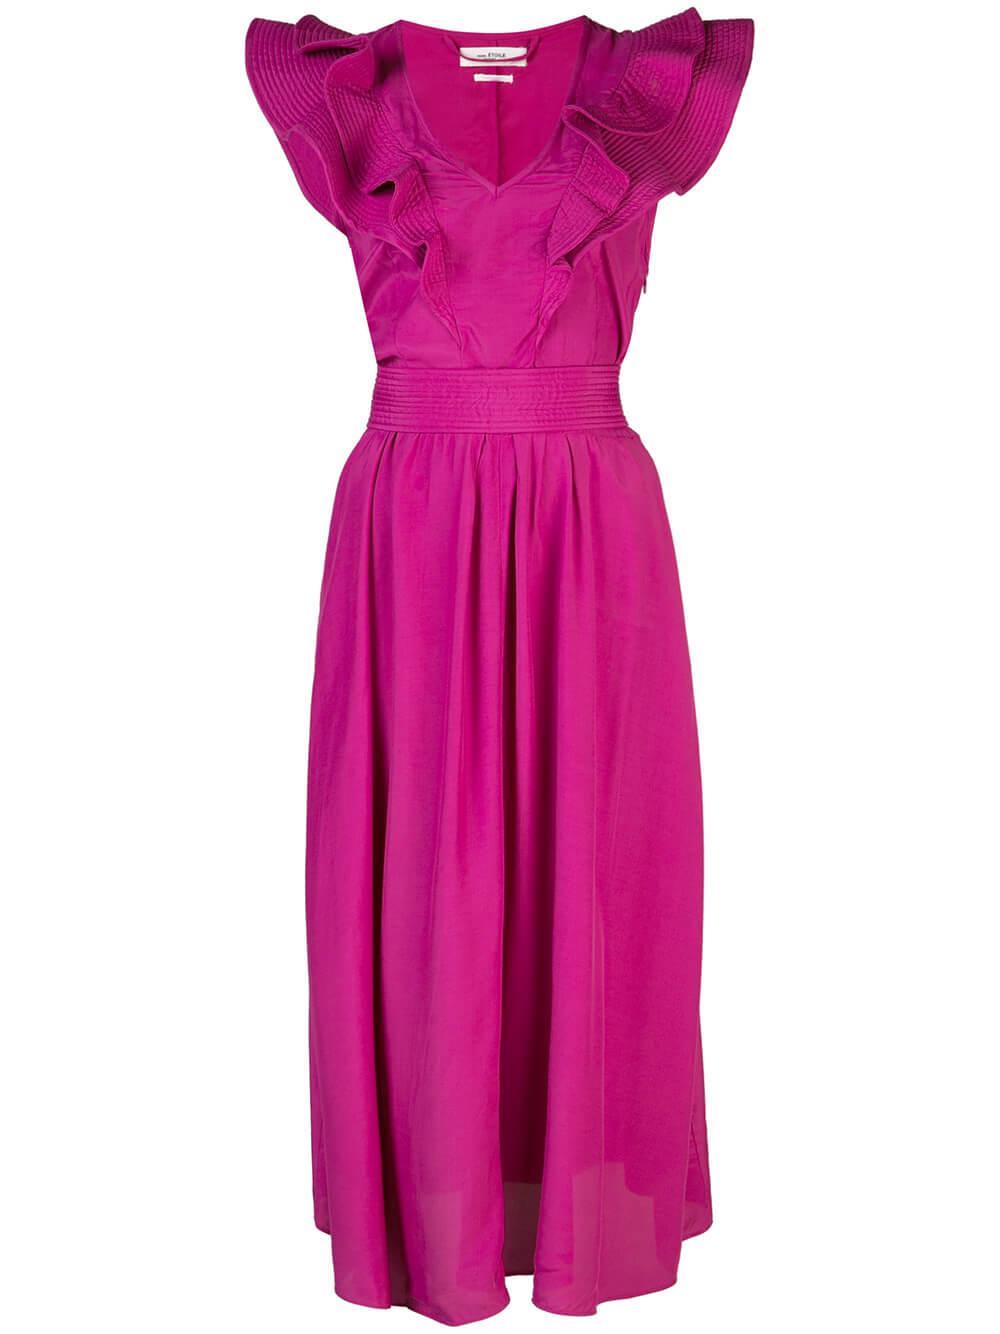 Coraline Solid Midi Dress Item # CORALINE-SOLID